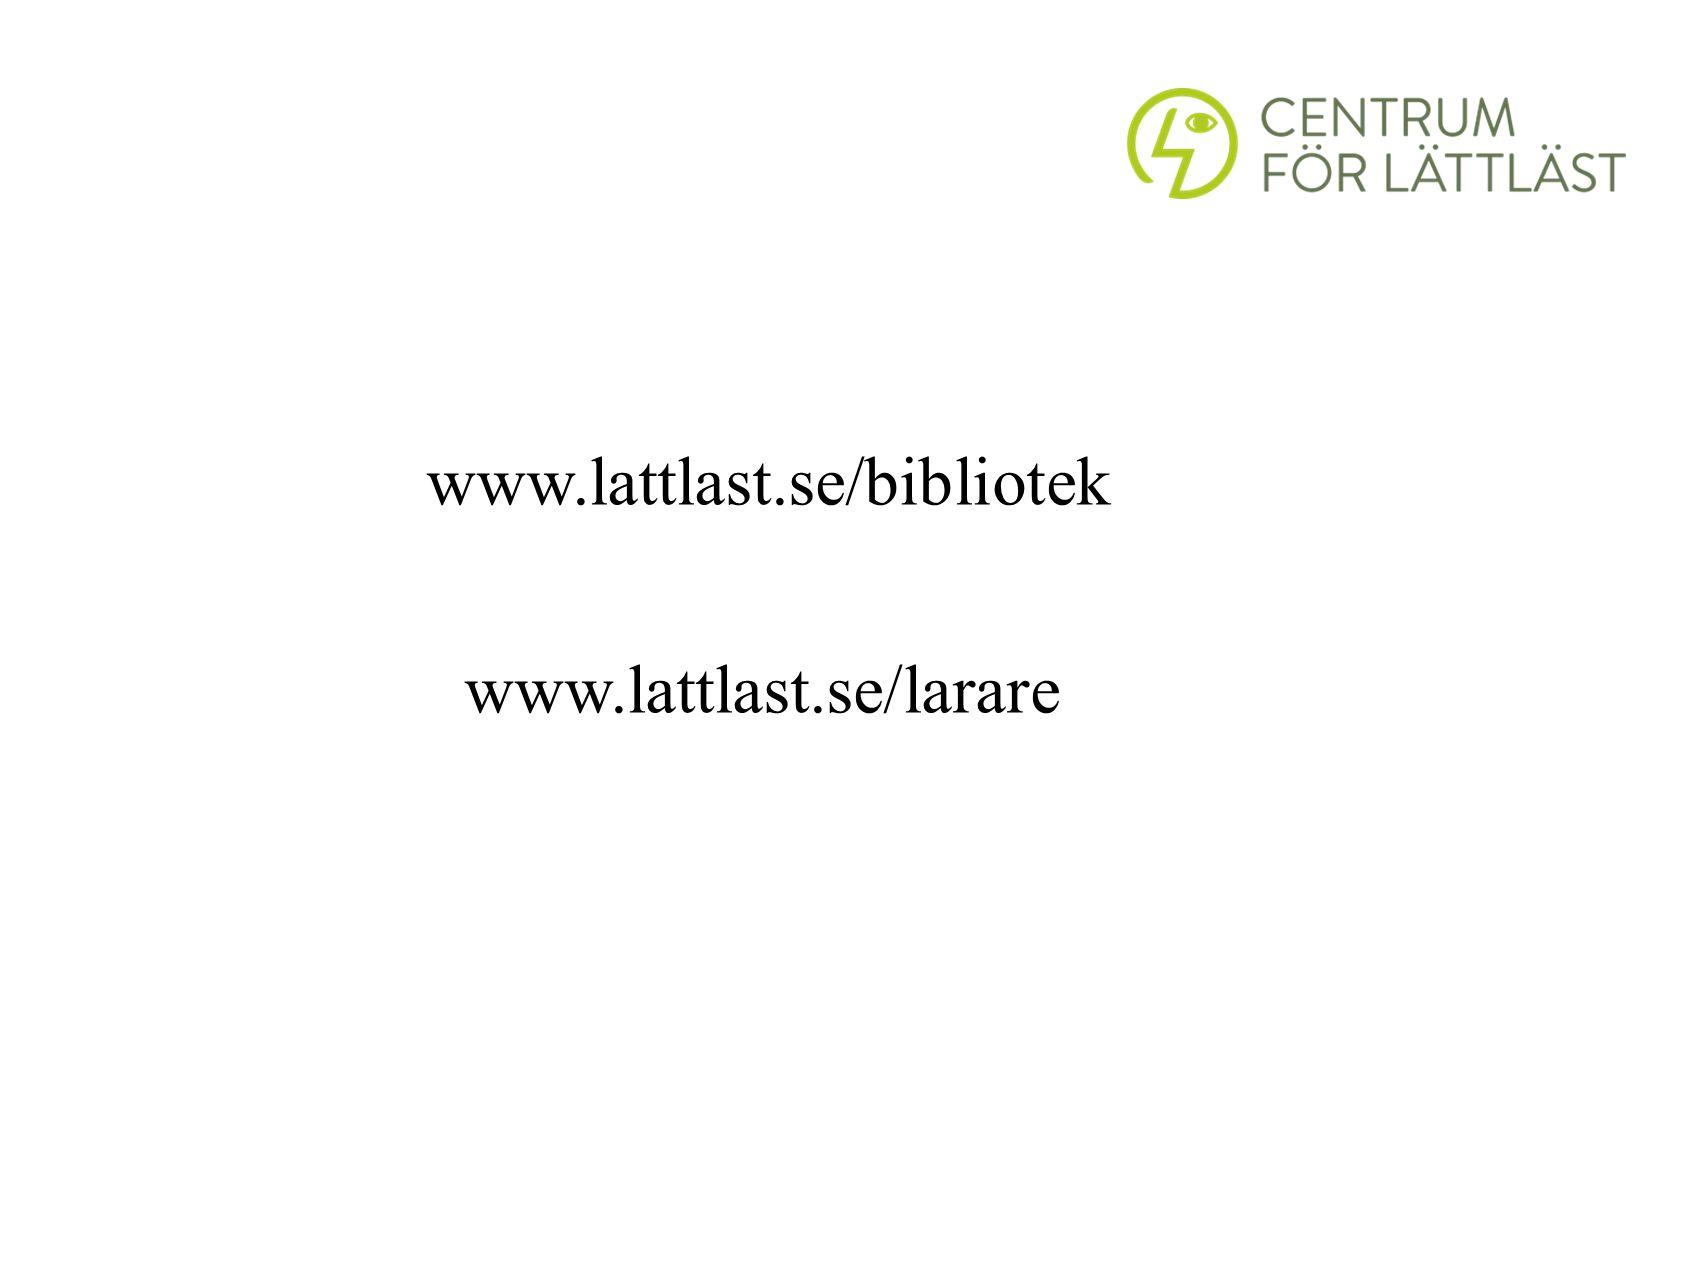 www.lattlast.se/bibliotek www.lattlast.se/larare